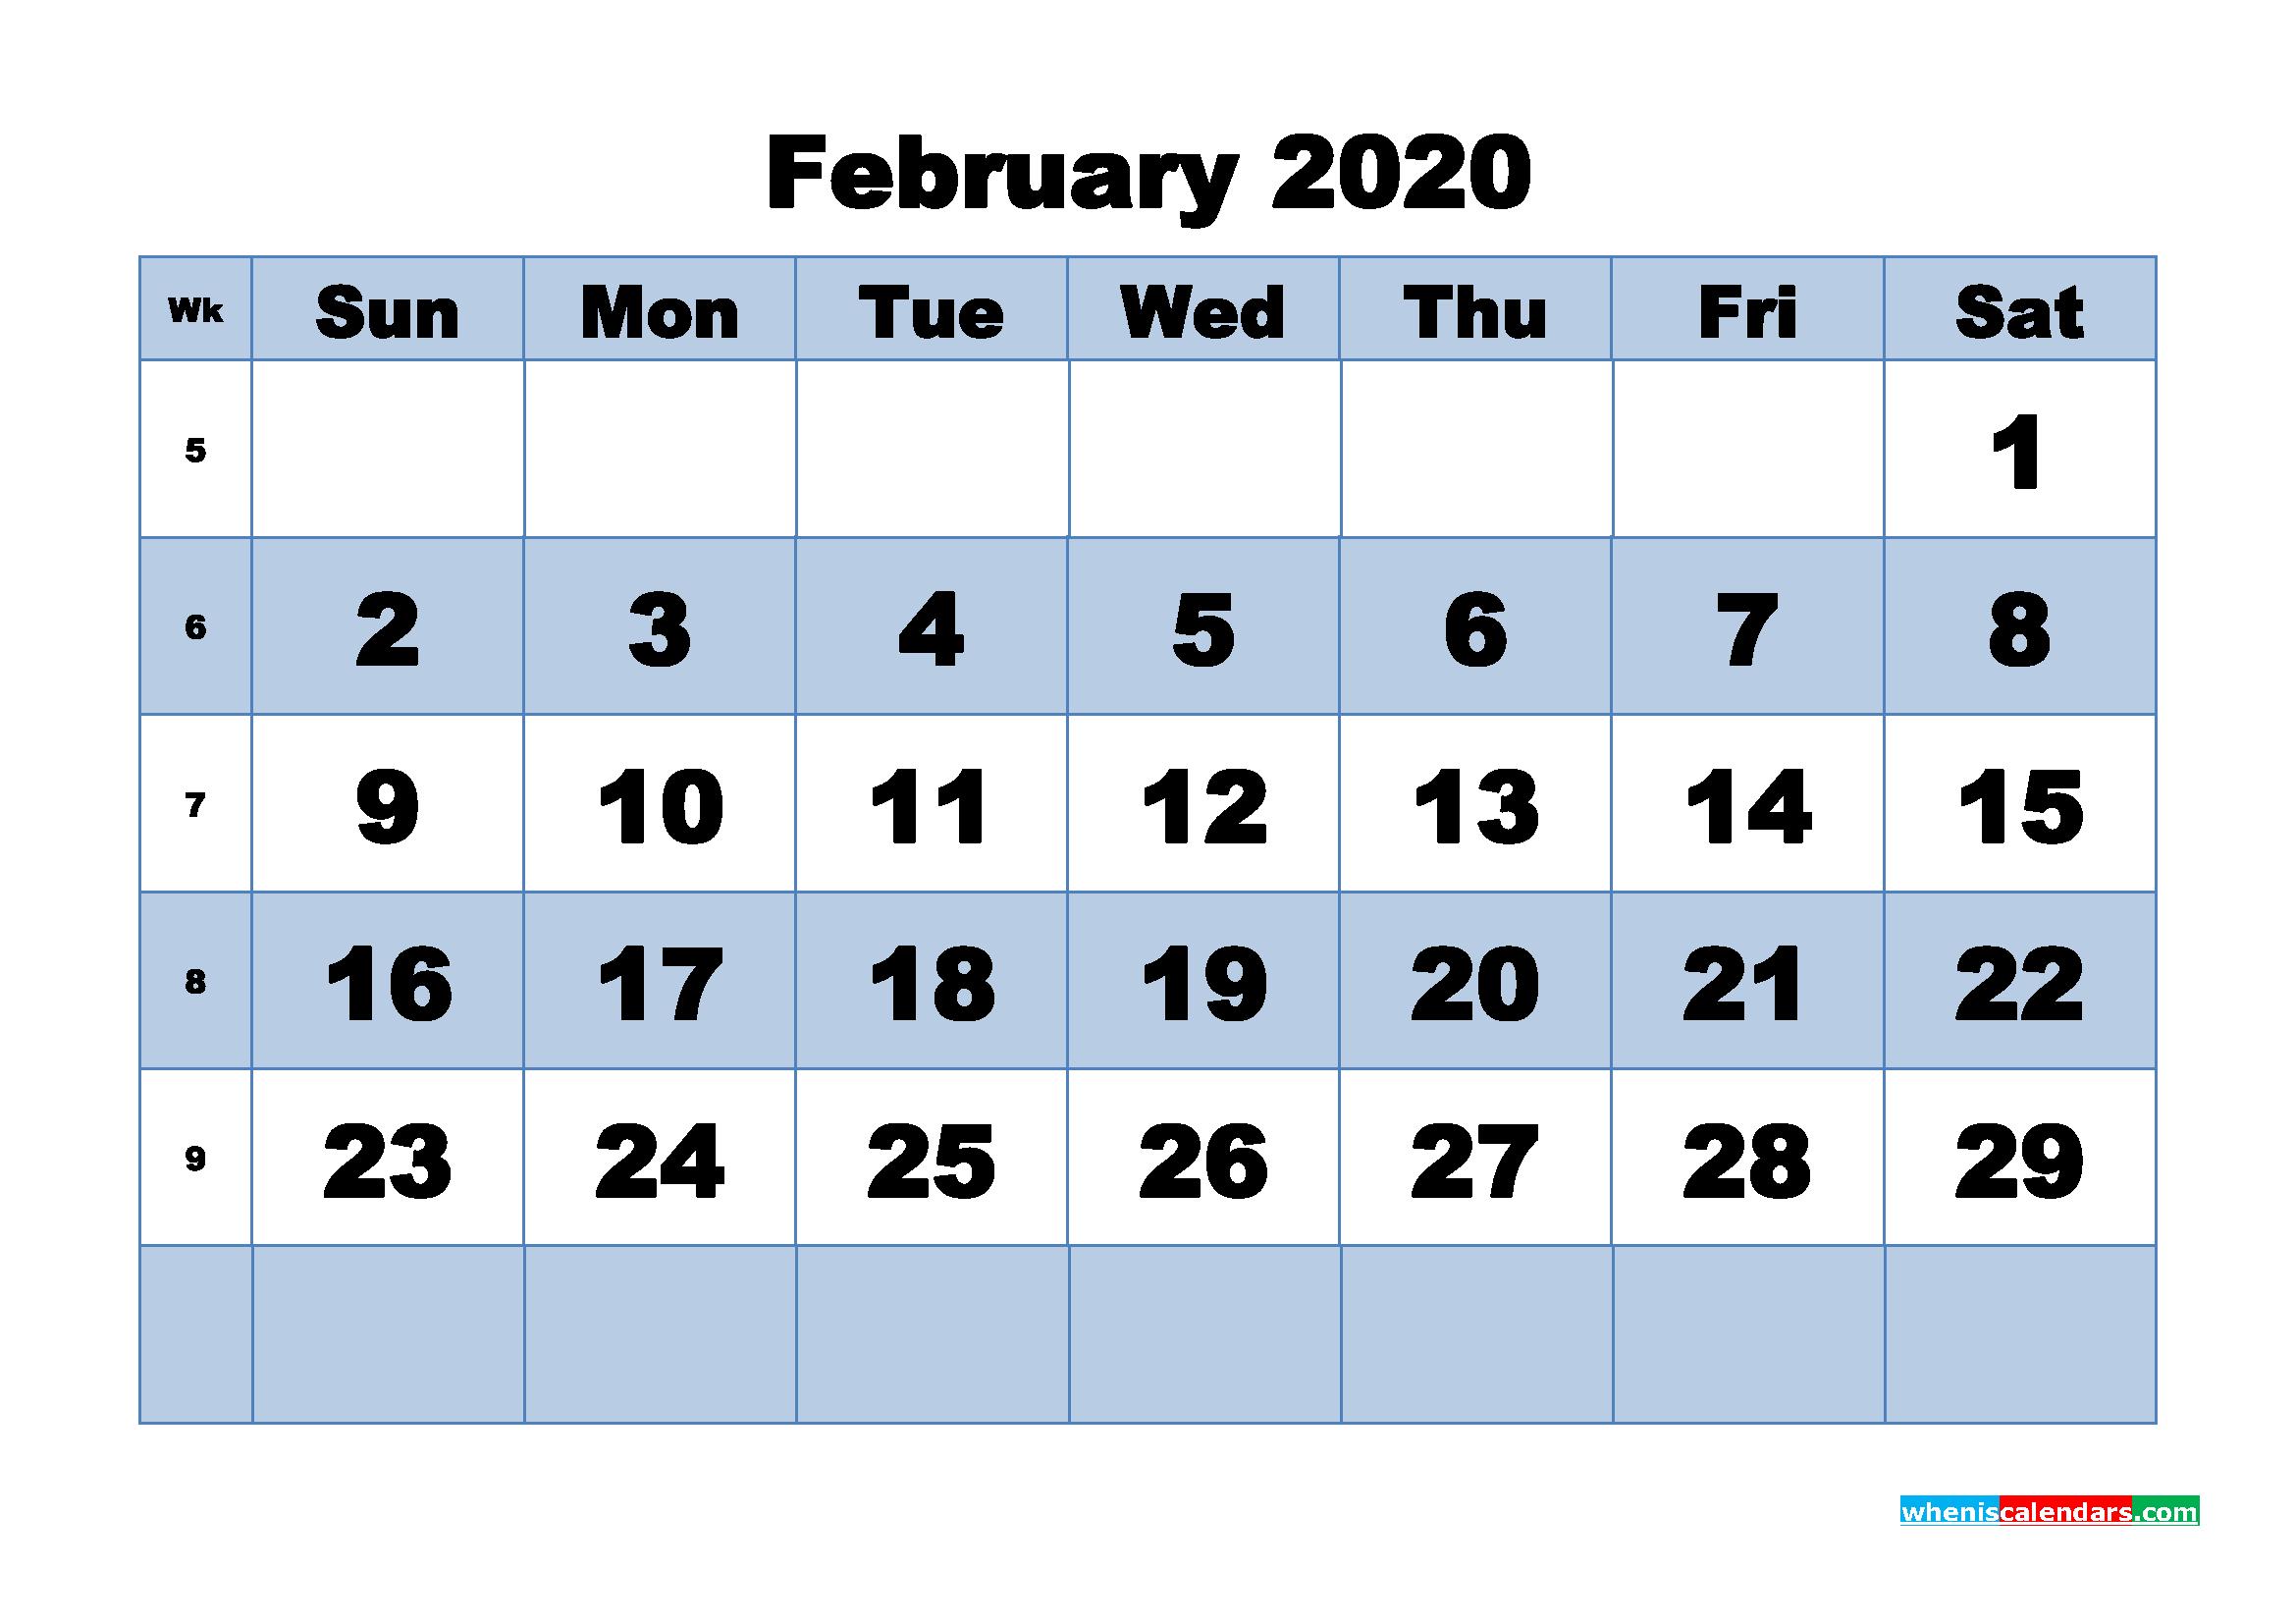 February Printable Calendar 2020 PDF, Word - No.m20b446